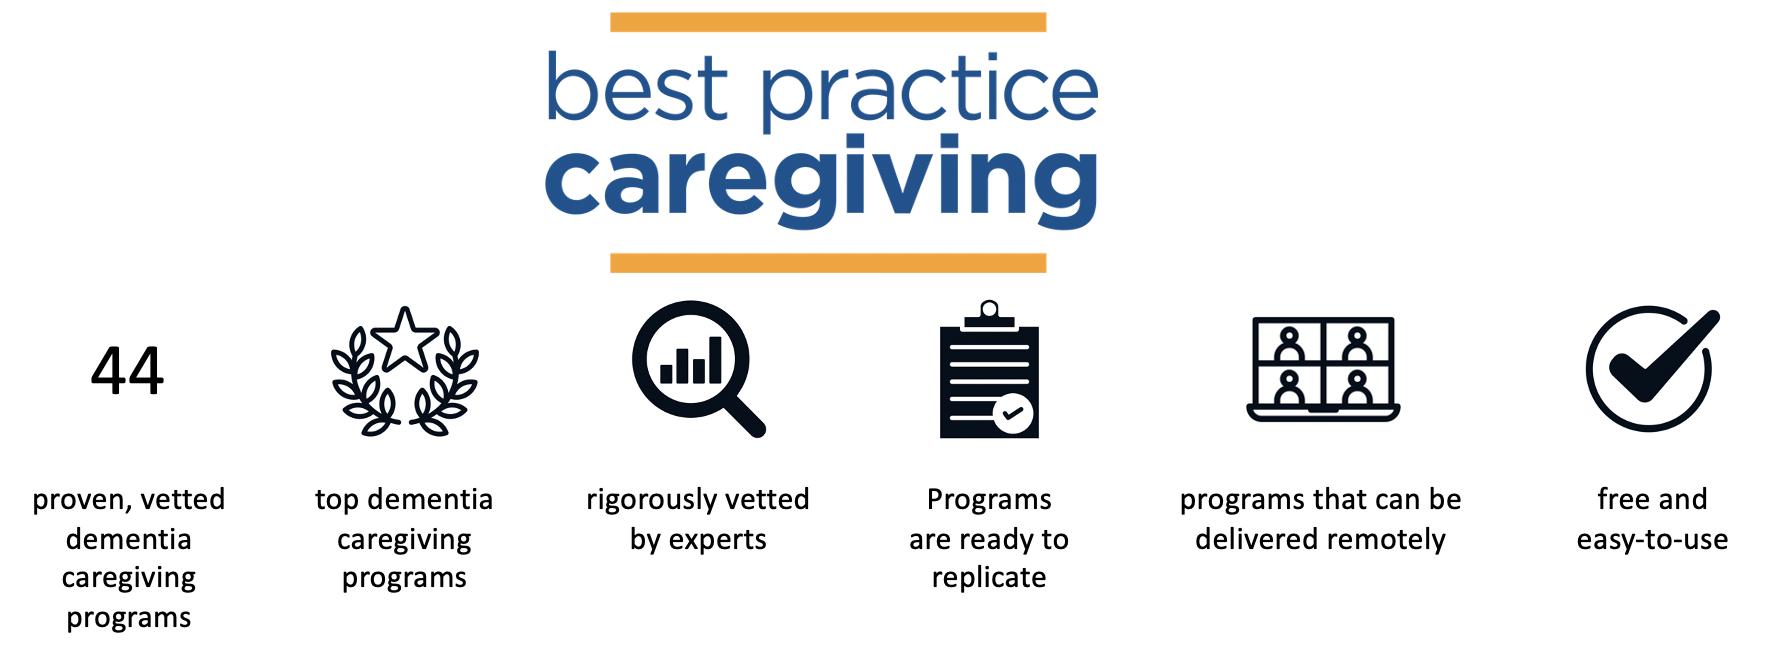 Best Practice Caregiving One Year image